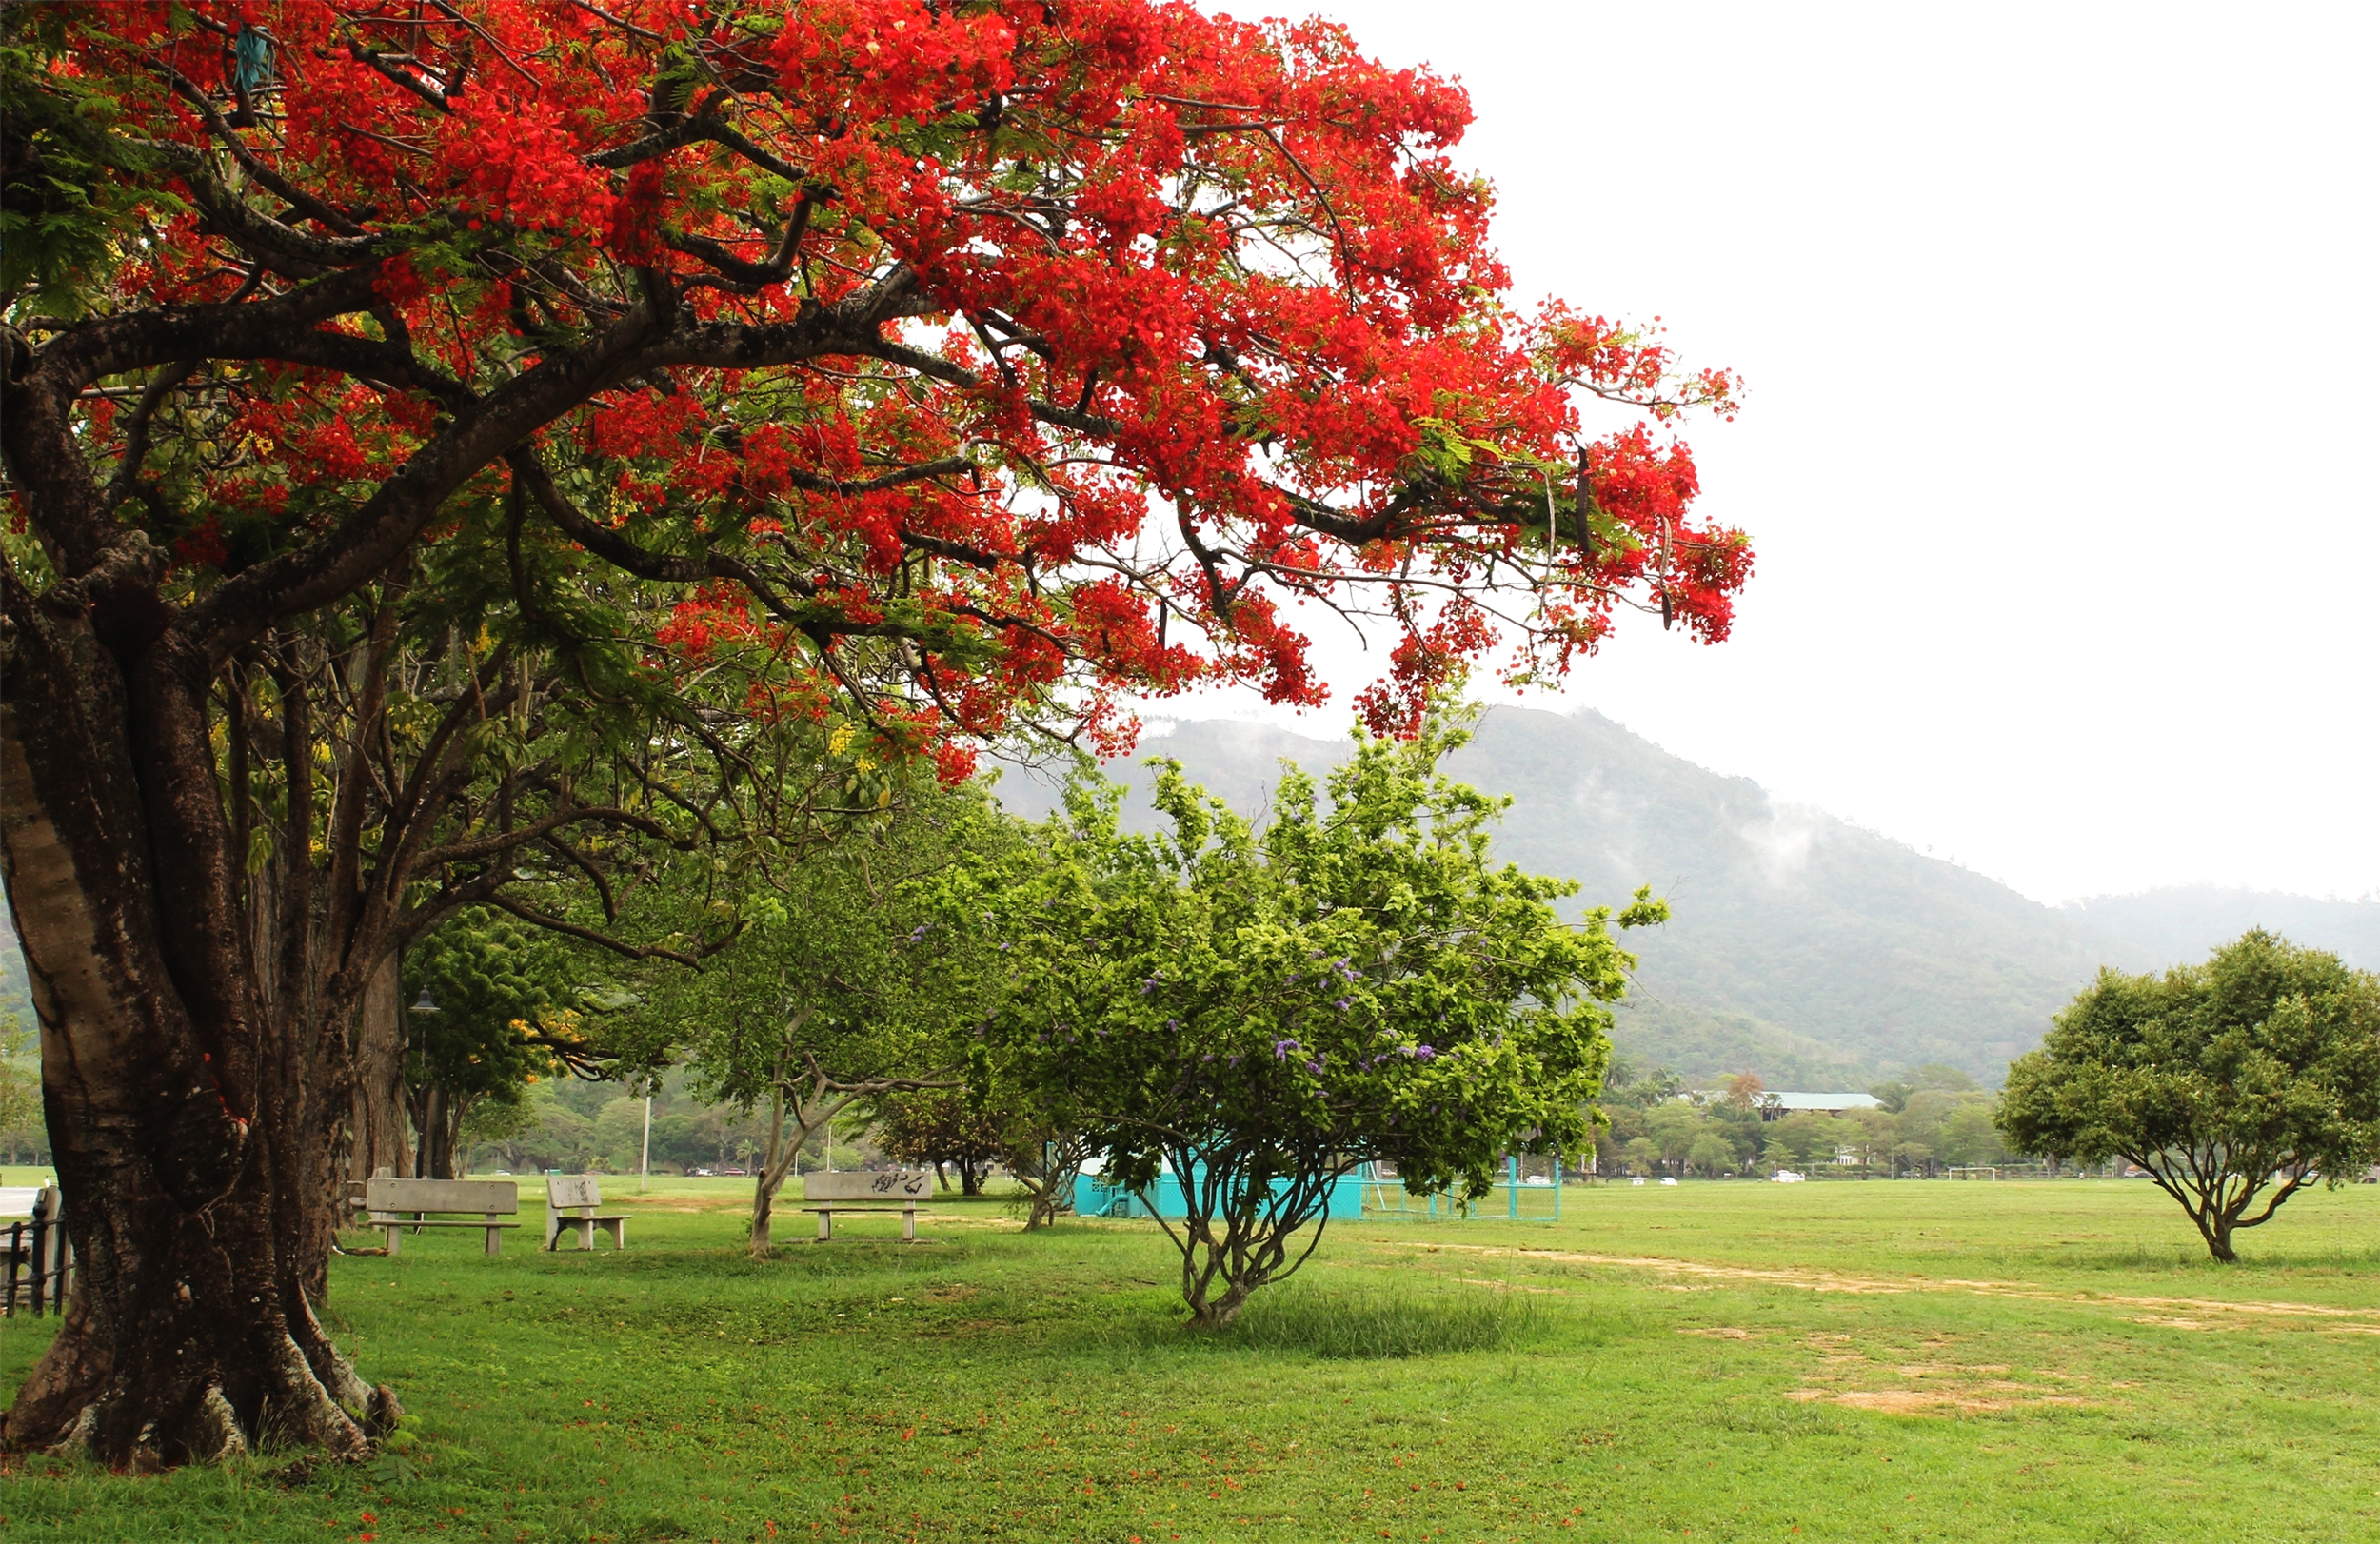 NISHLA-Design_Poui-Trees-Trinidad_IMG_1293.jpg